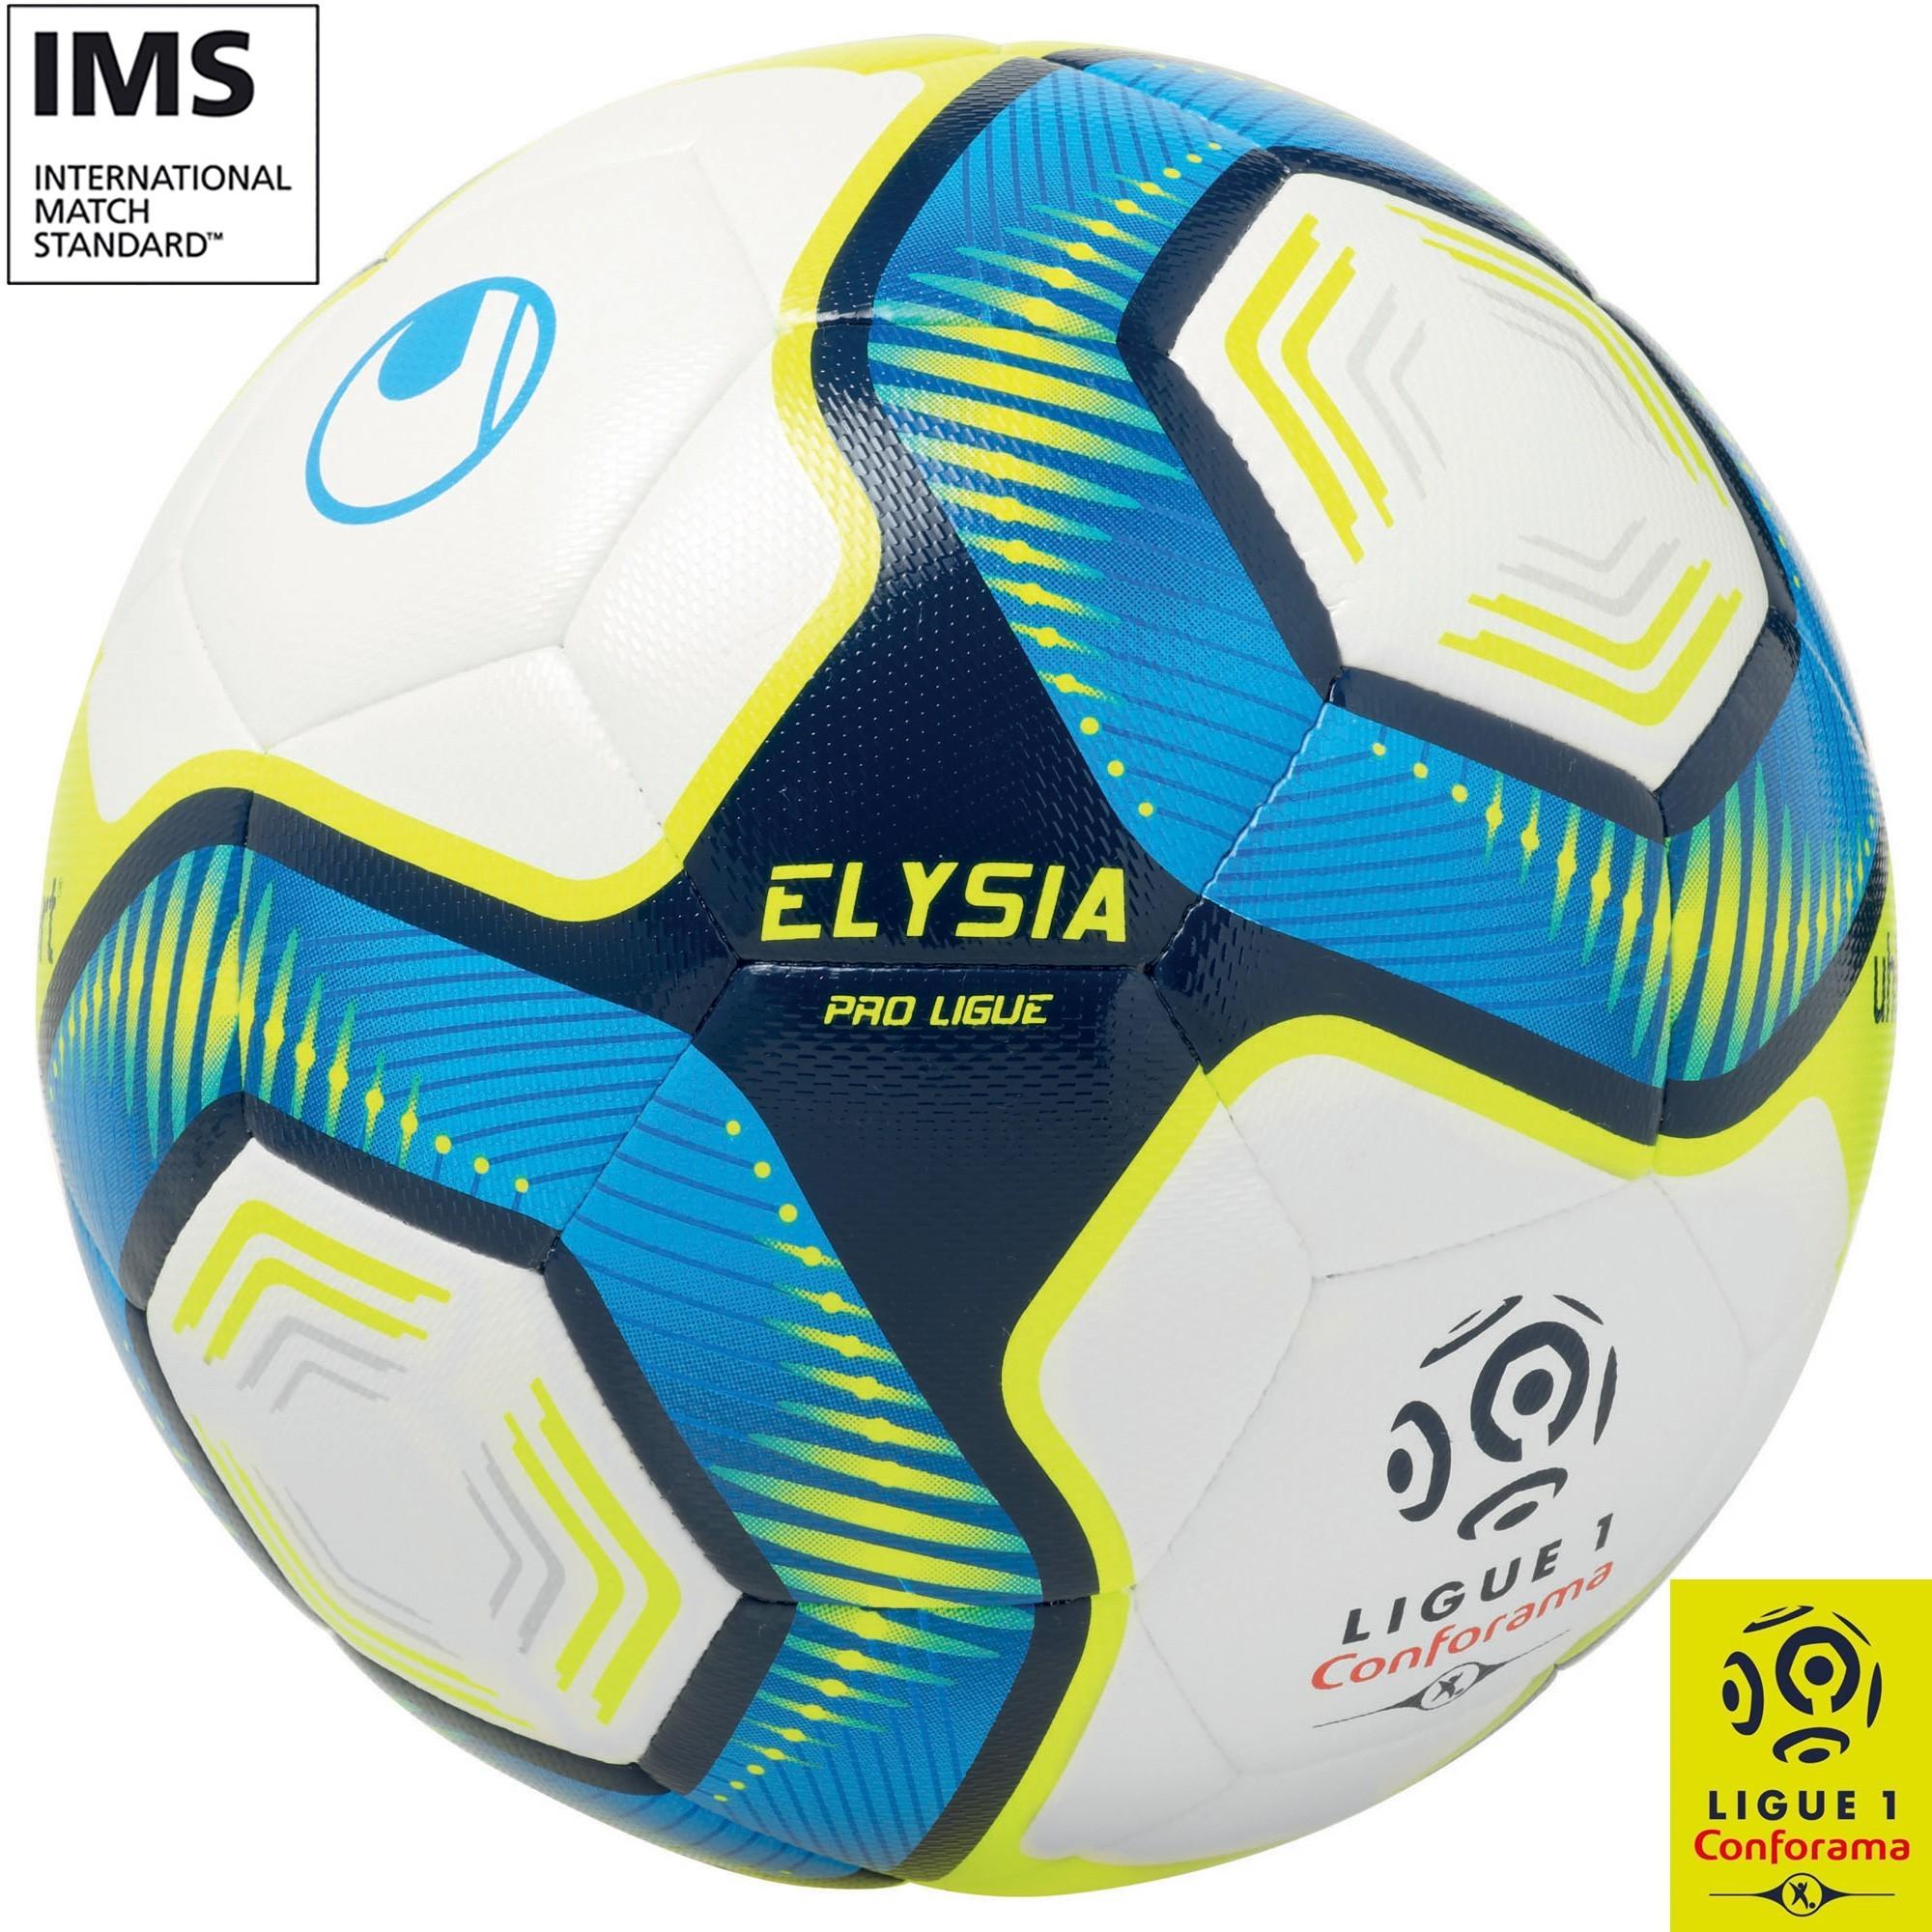 Coffret collector Elysia Pro Ligue 1